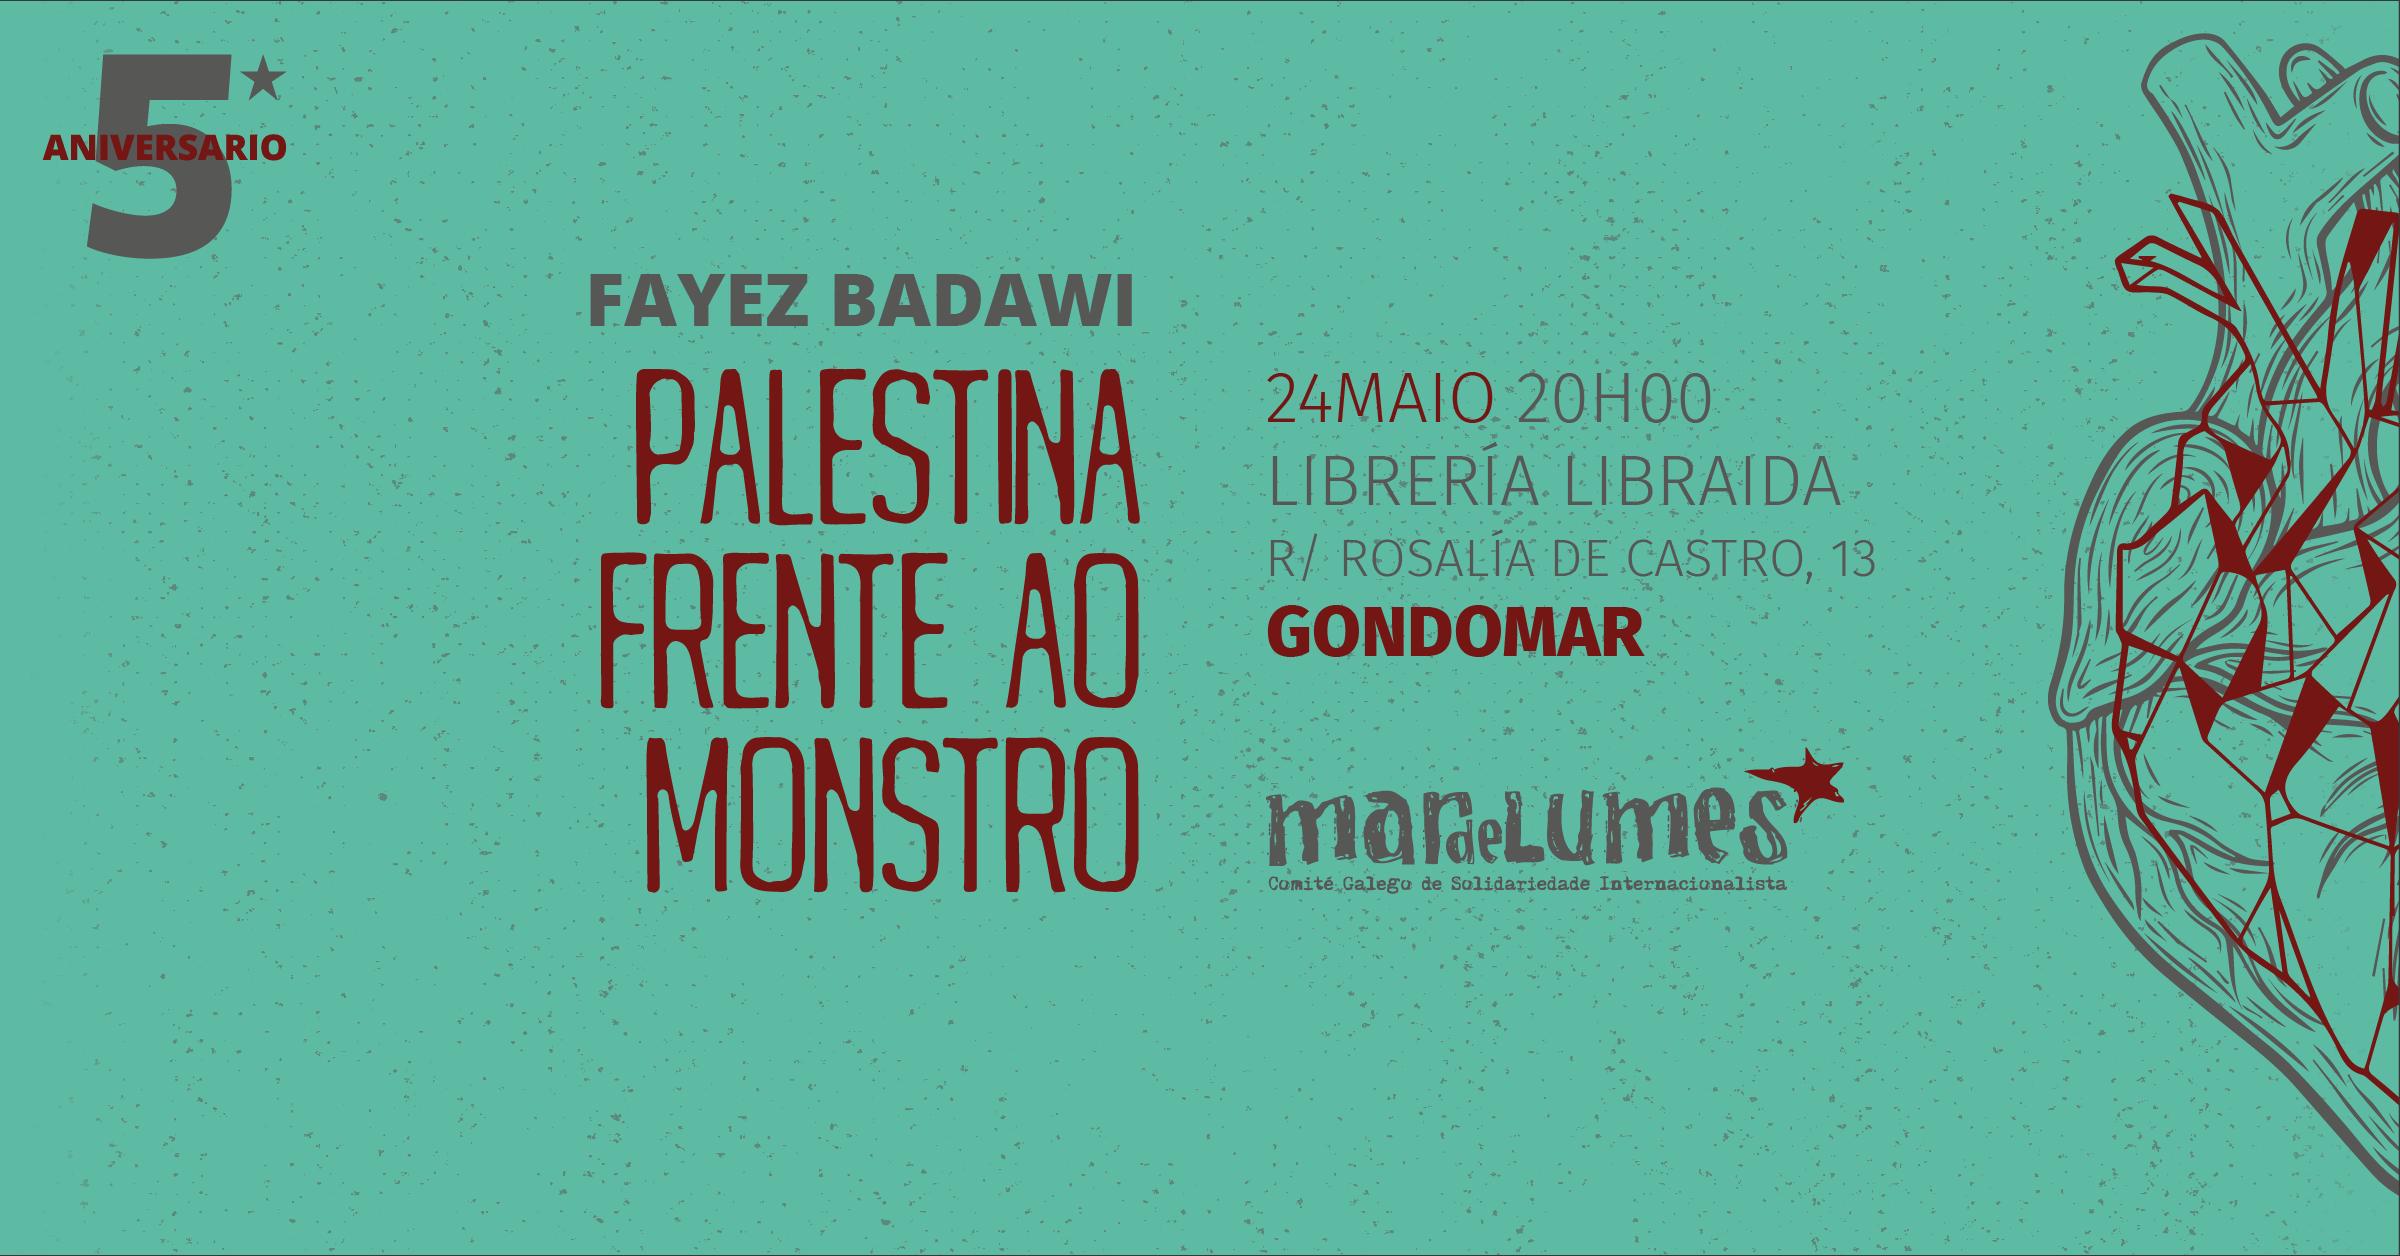 Palestina frente ao monstro